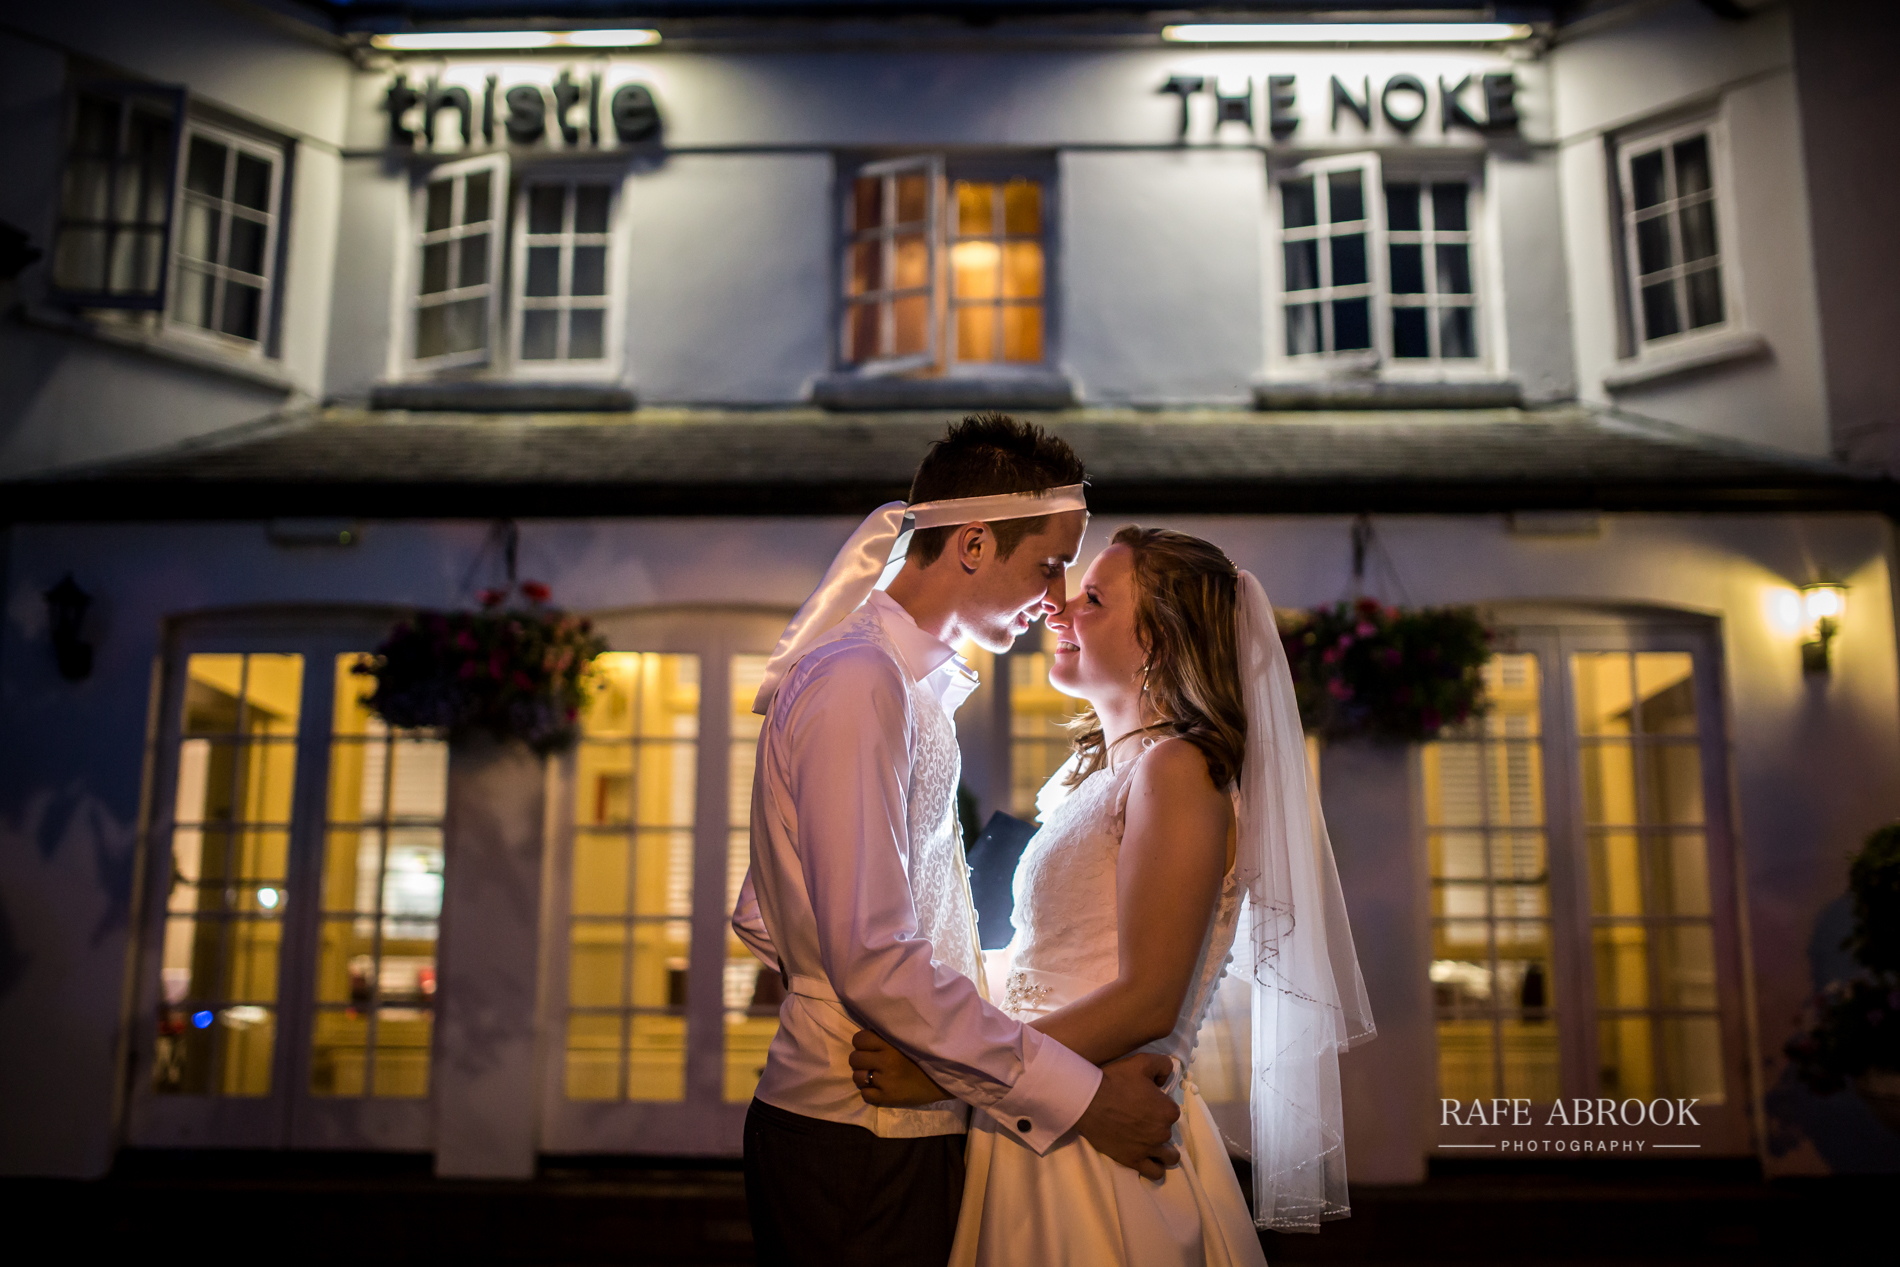 wedding photographer hertfordshire noke thistle hotel st albans -1526.jpg